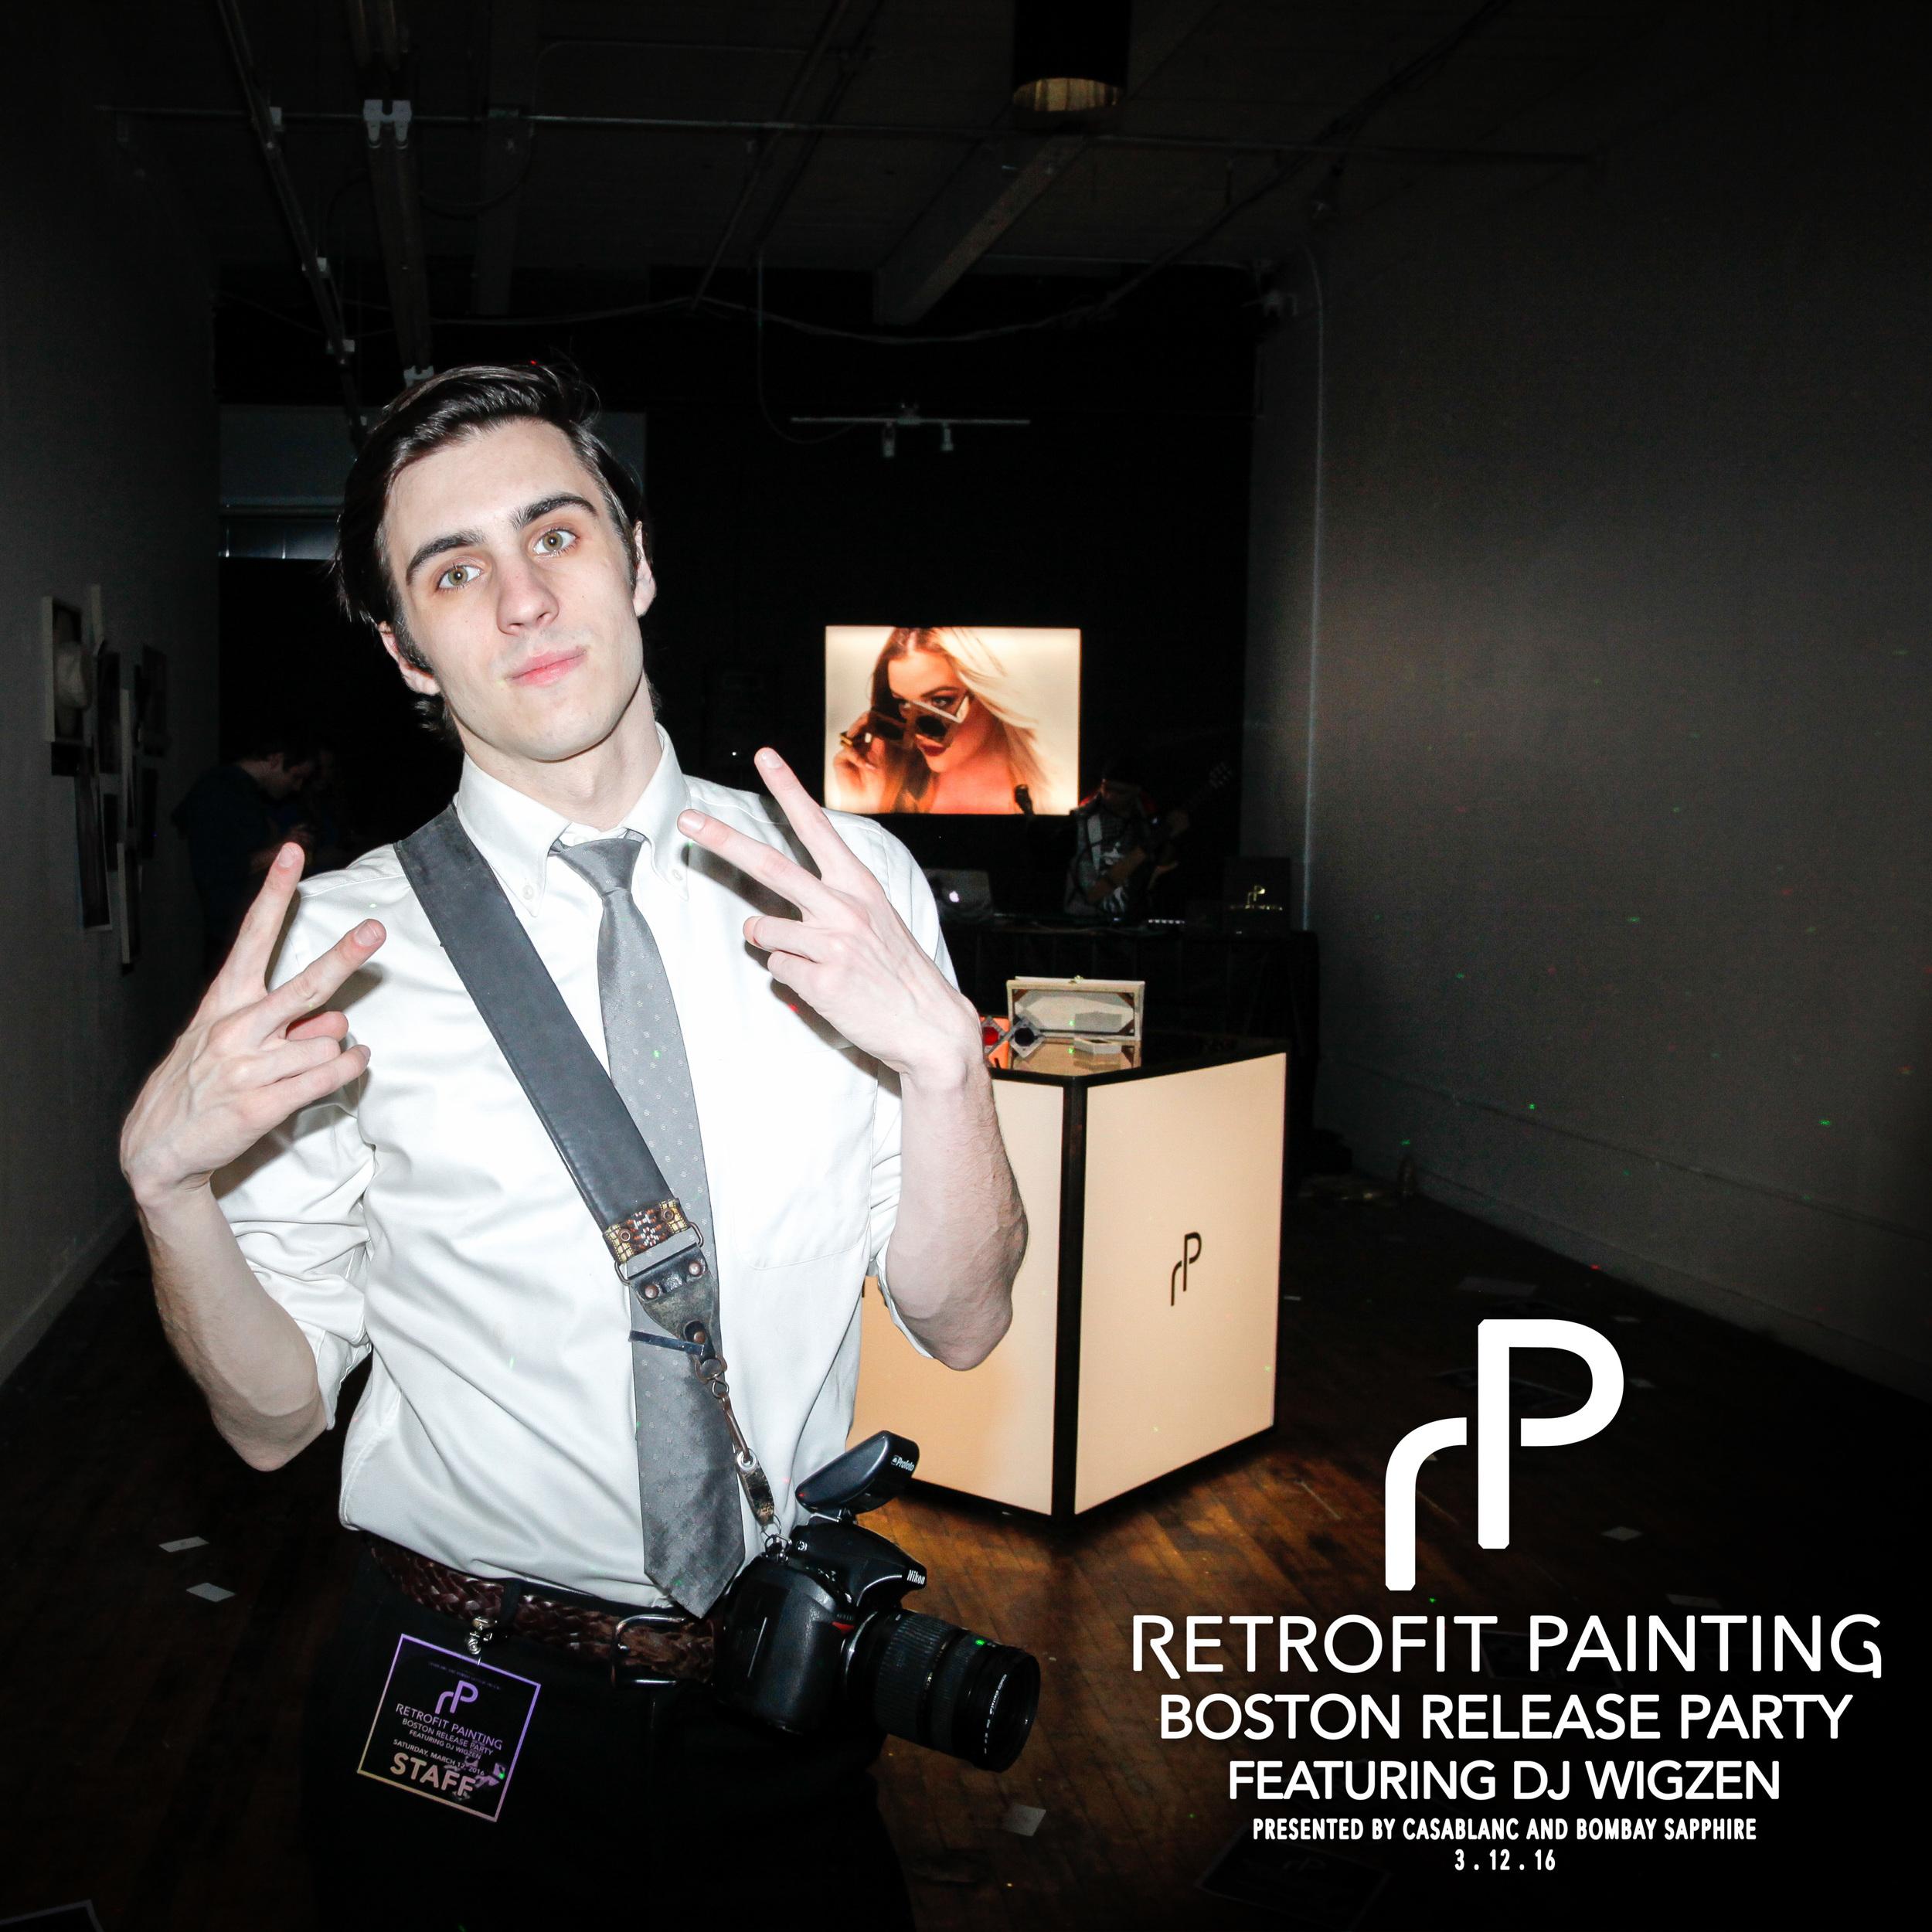 Retrofit Painting Boston Release Party 0038.jpg